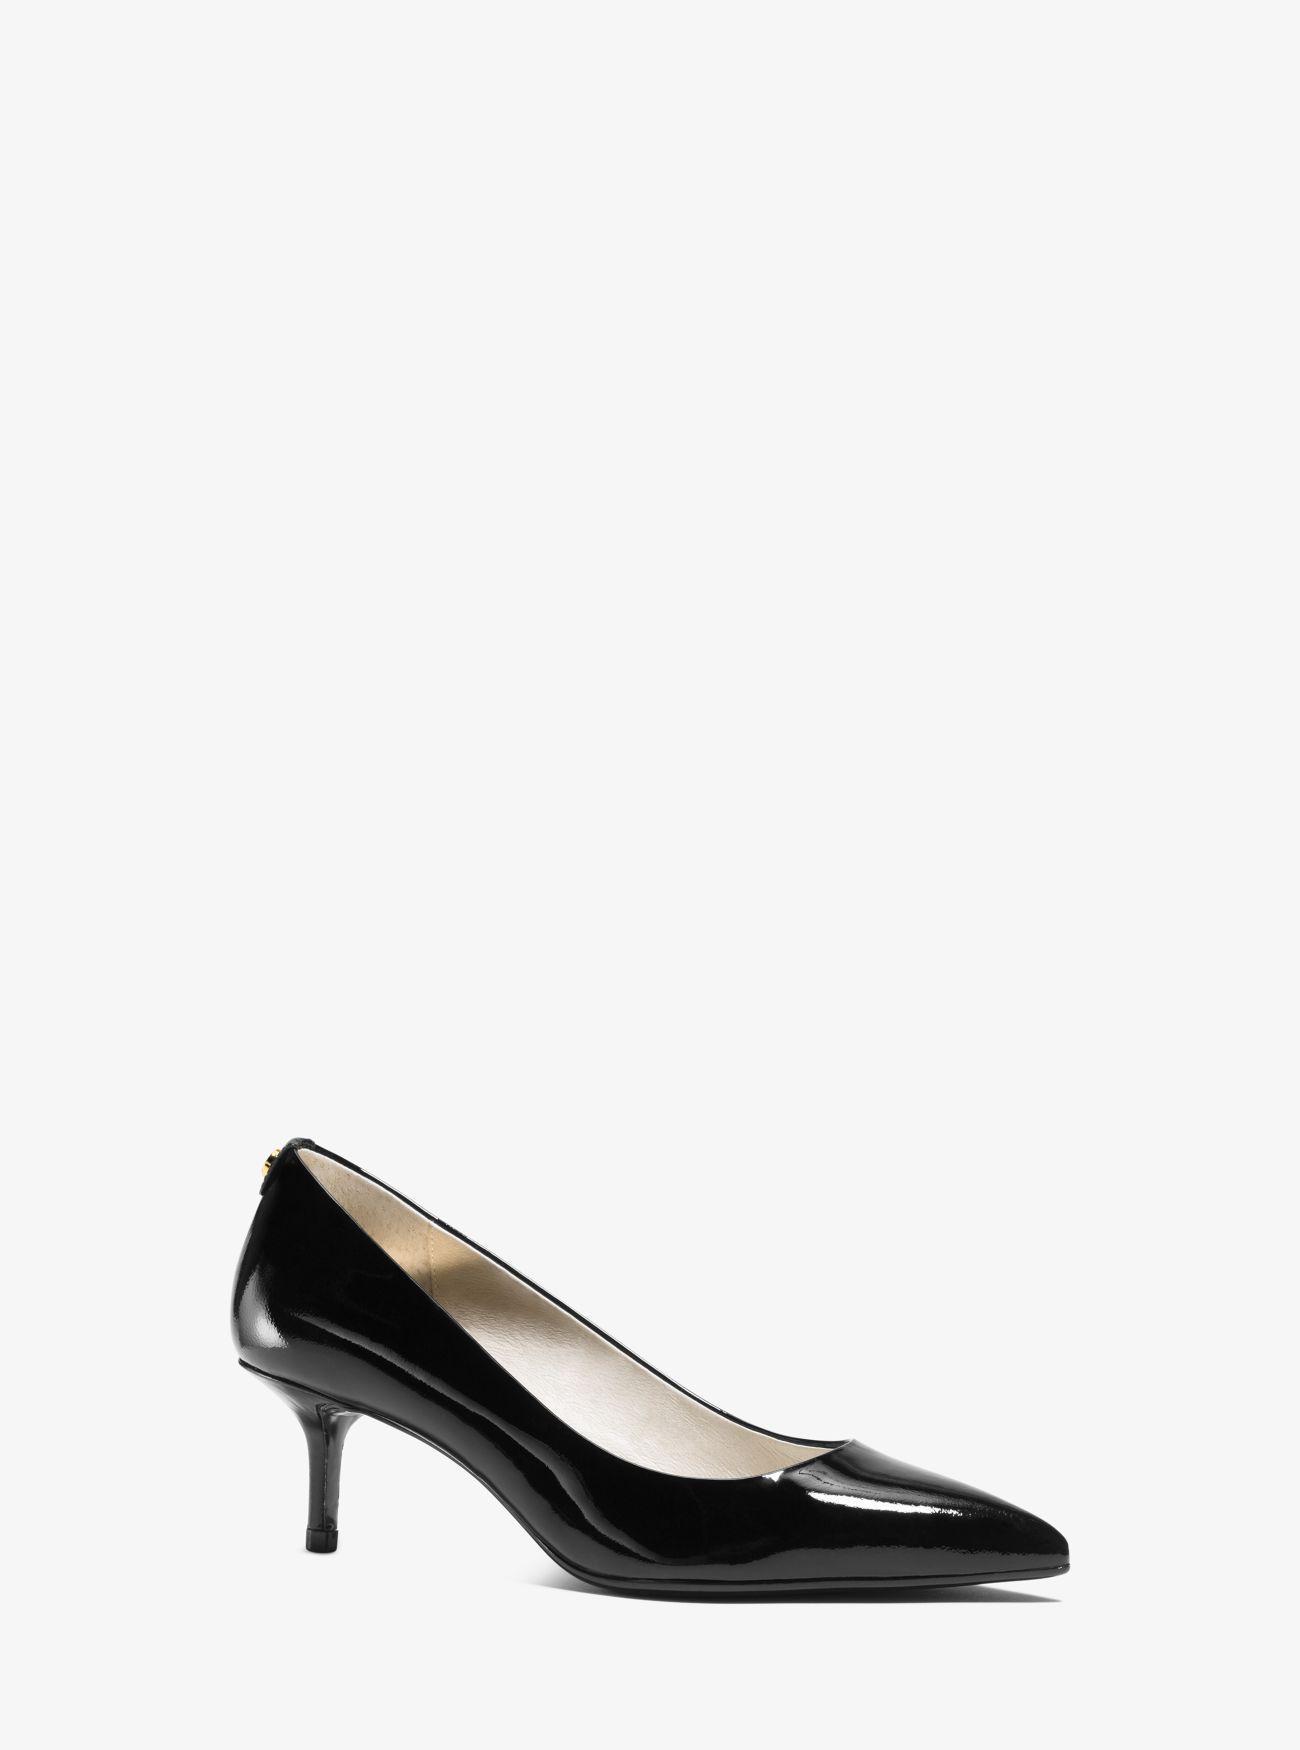 d577c5607da9 Lyst - MICHAEL Michael Kors Flex Patent-leather Kitten-heel Pump in ...